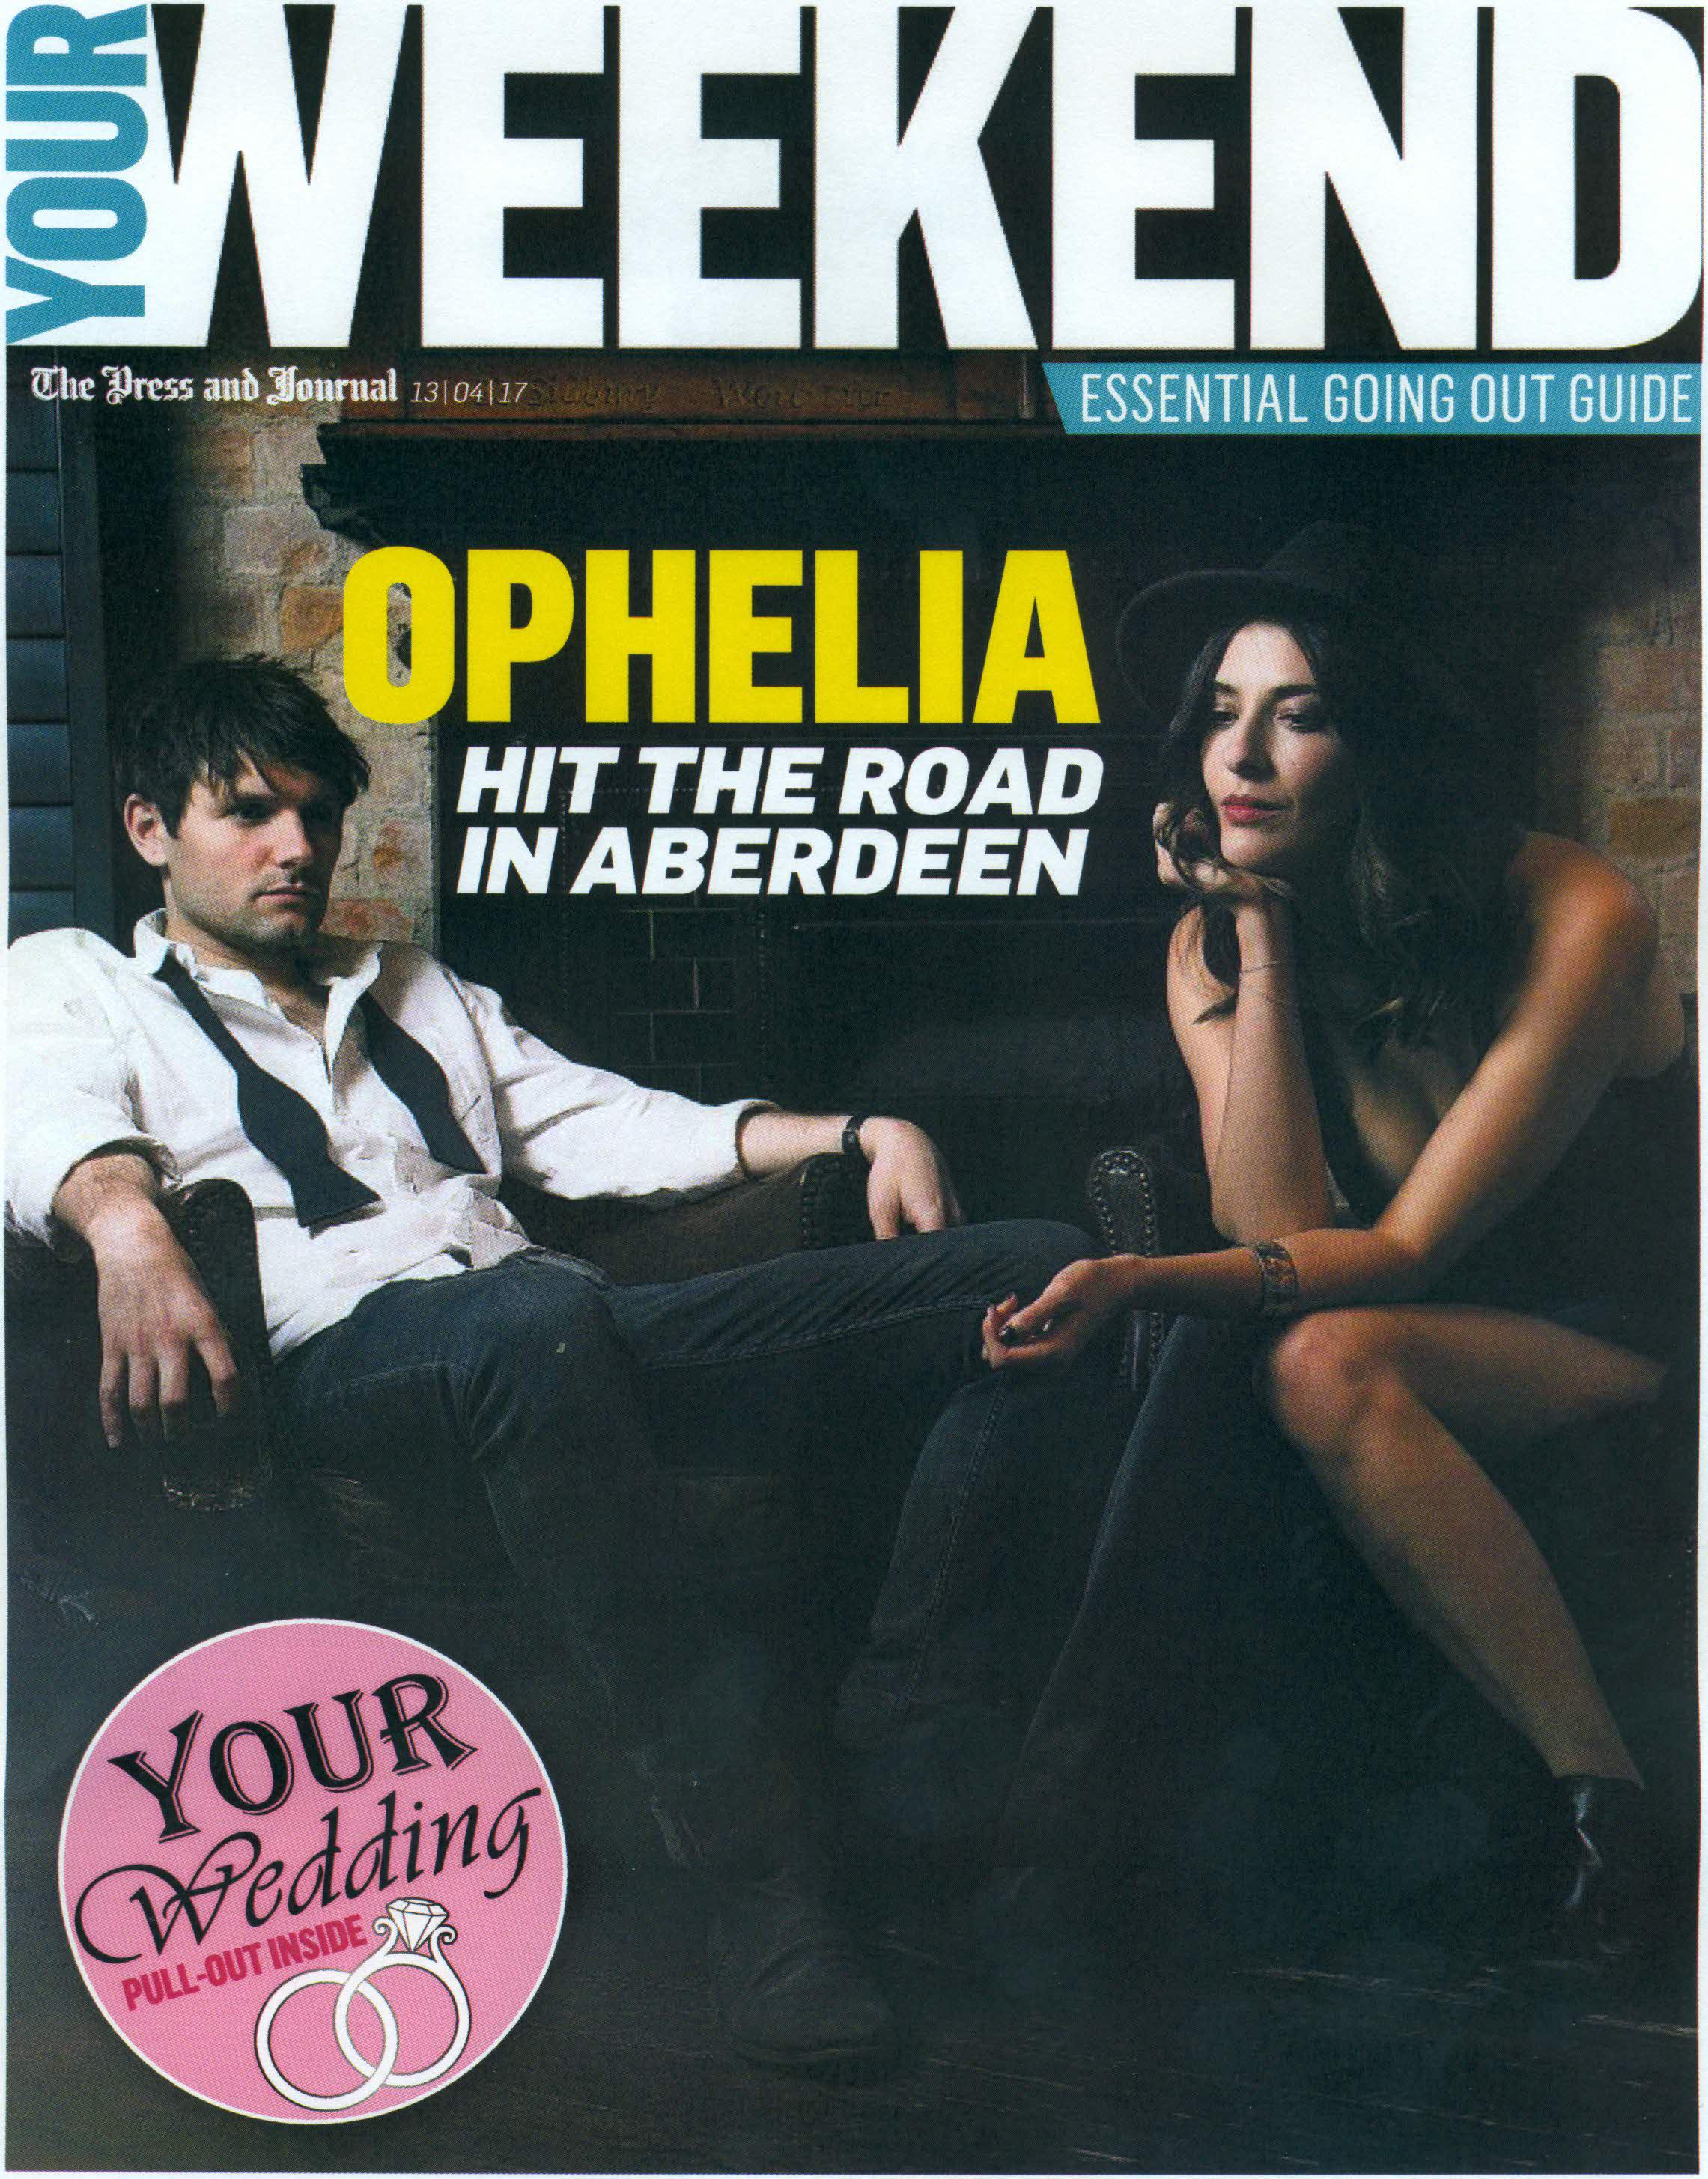 Ophelia - Press & Journal - Supplement Cover.jpg